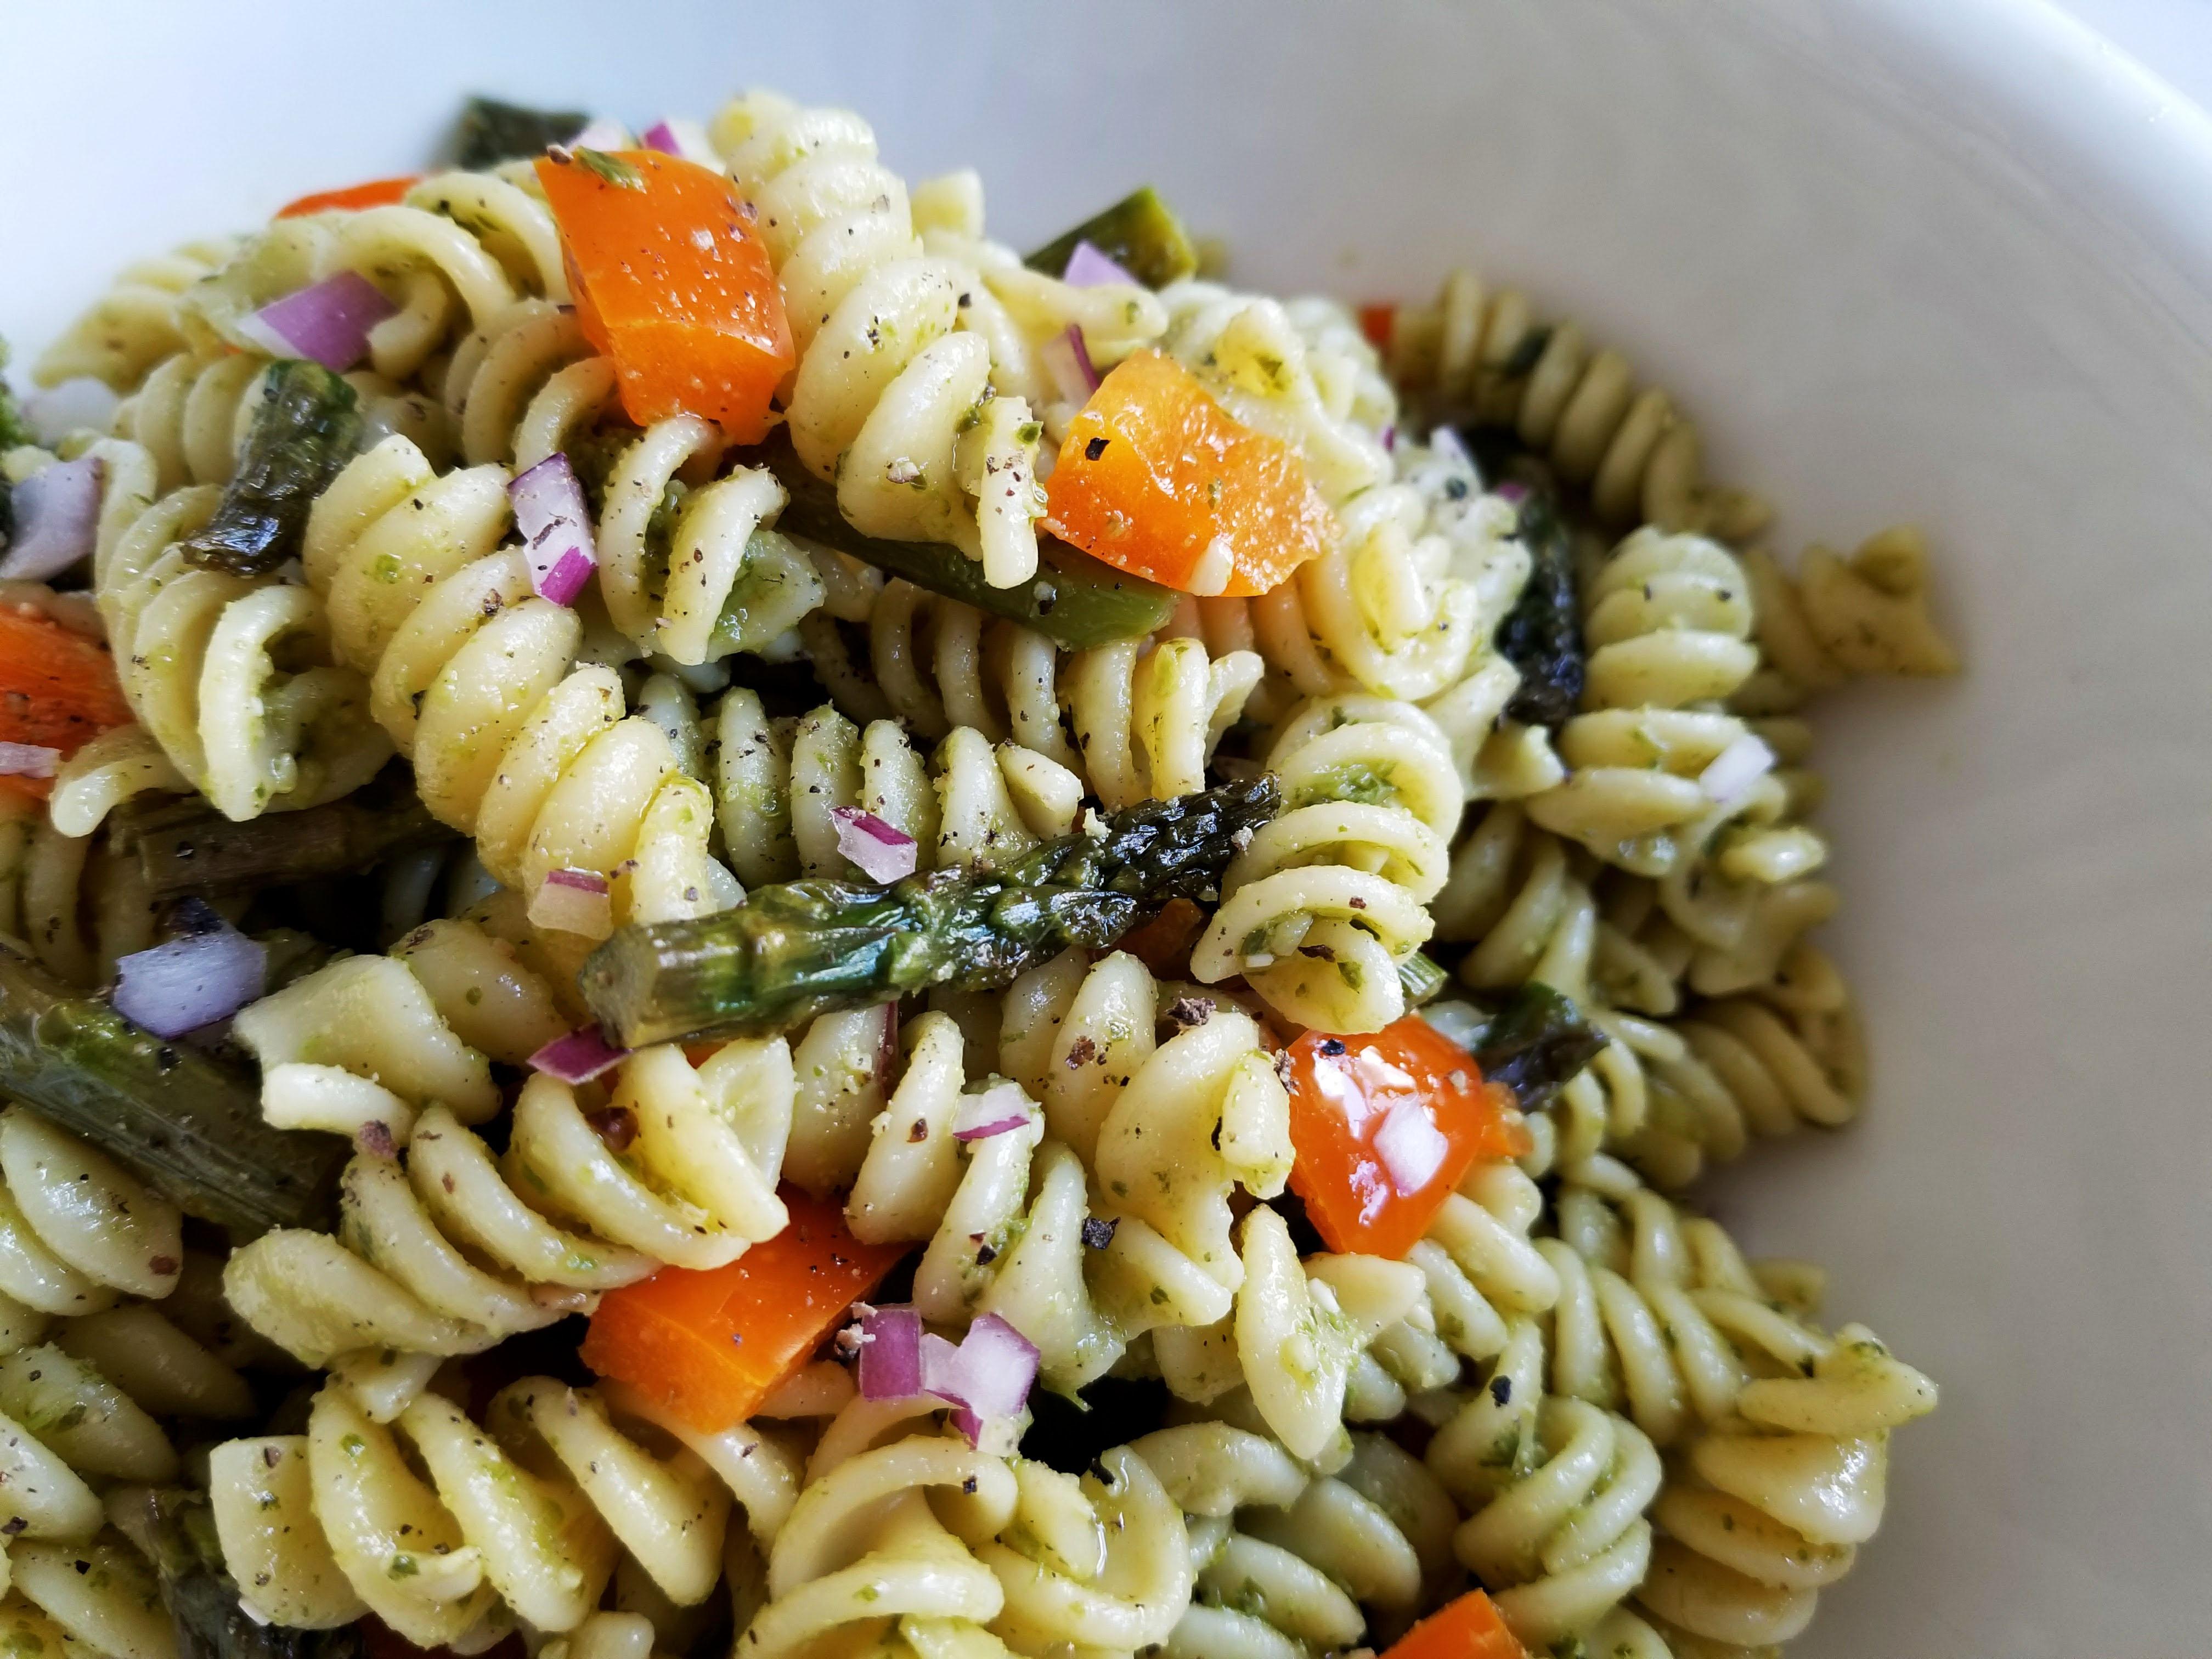 pesto pasta salad with asparagus